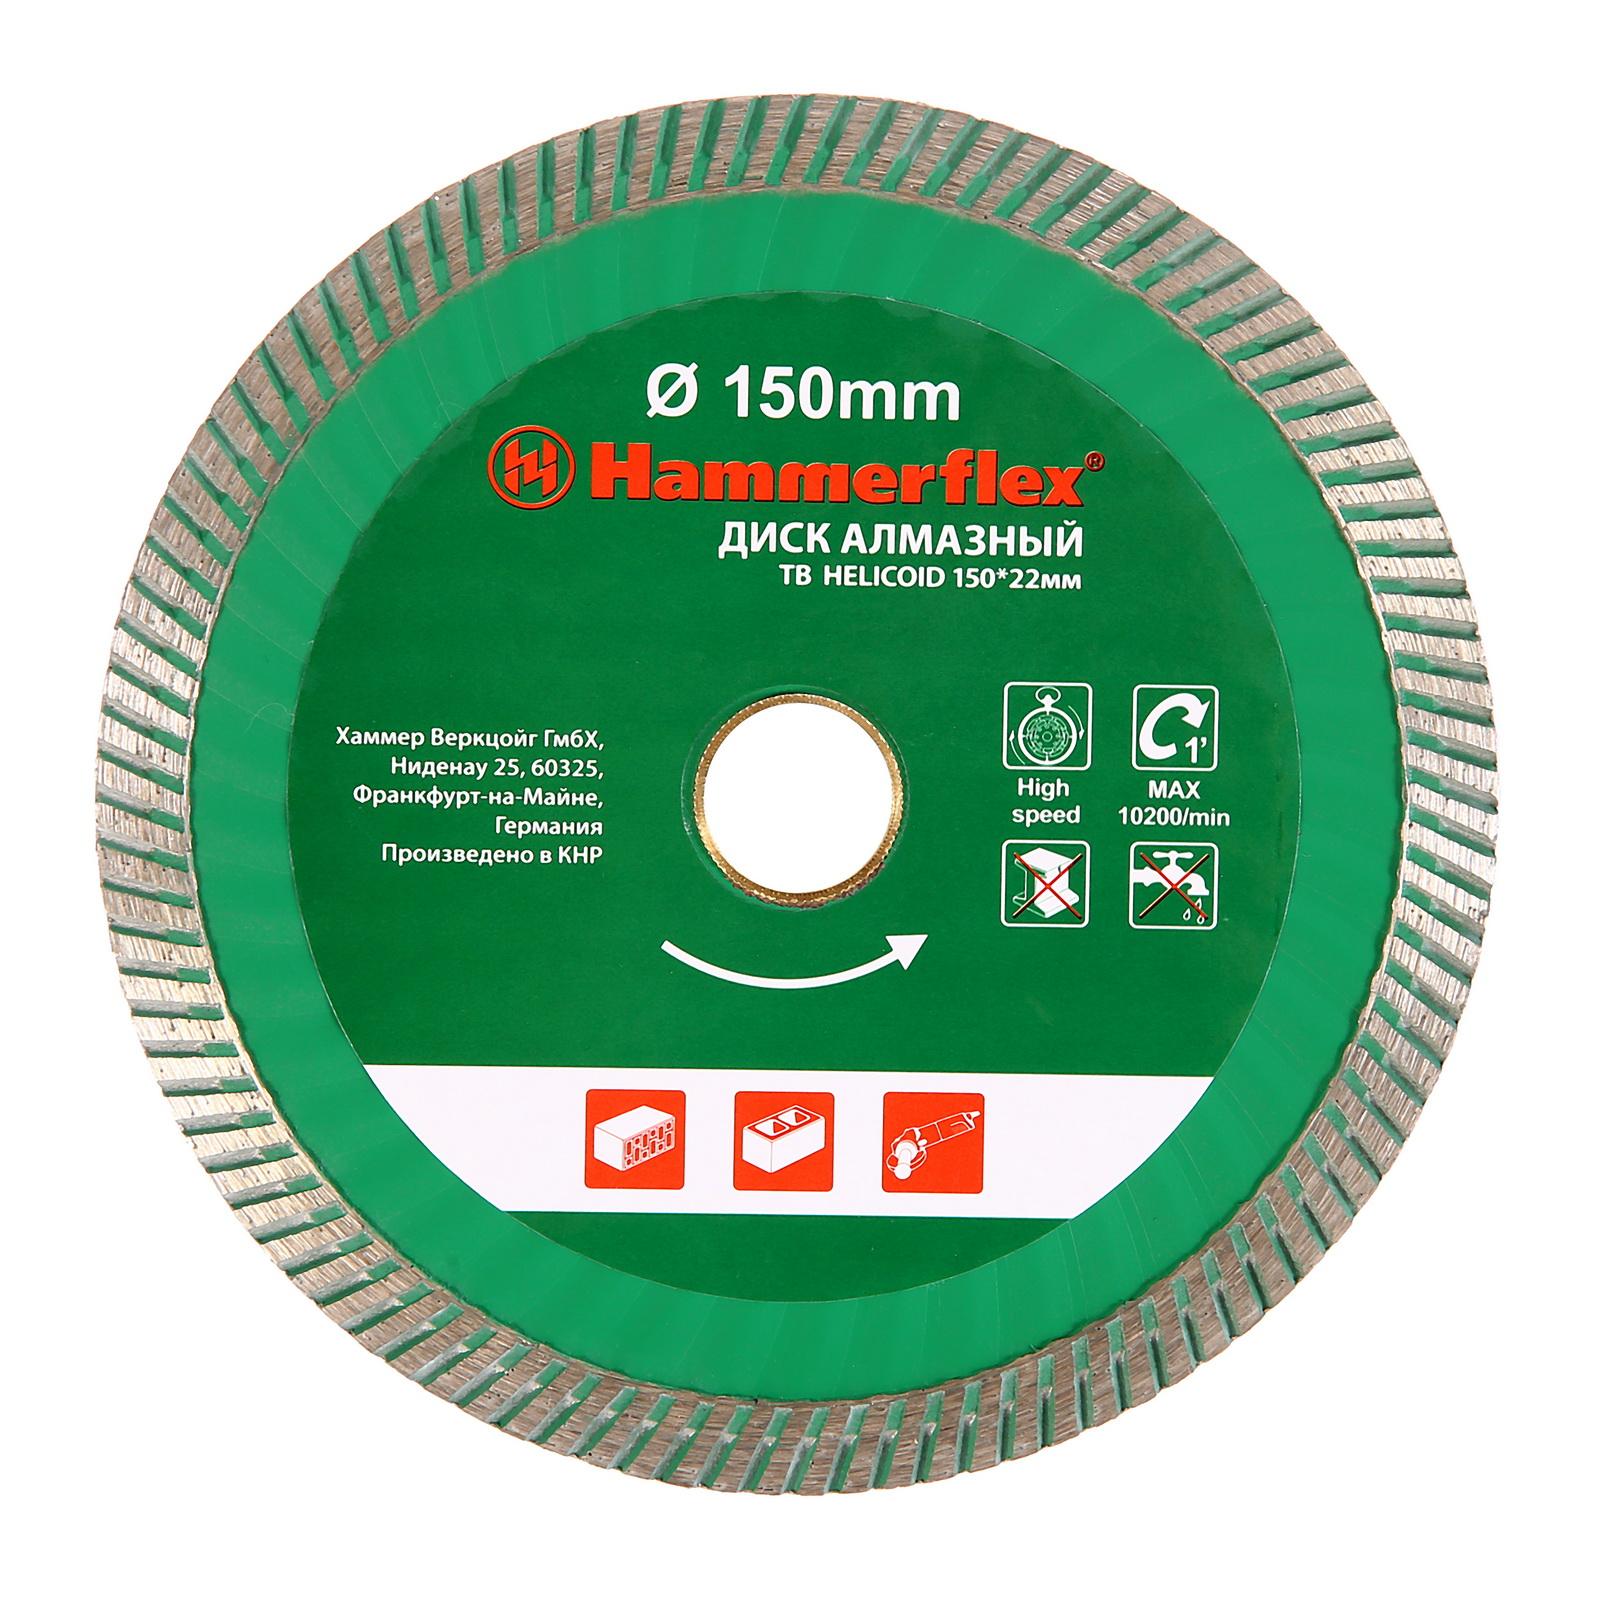 Круг алмазный Hammer 206-138 db tb helicoid диск алмазный diam 150х22 2мм master турбо 000160